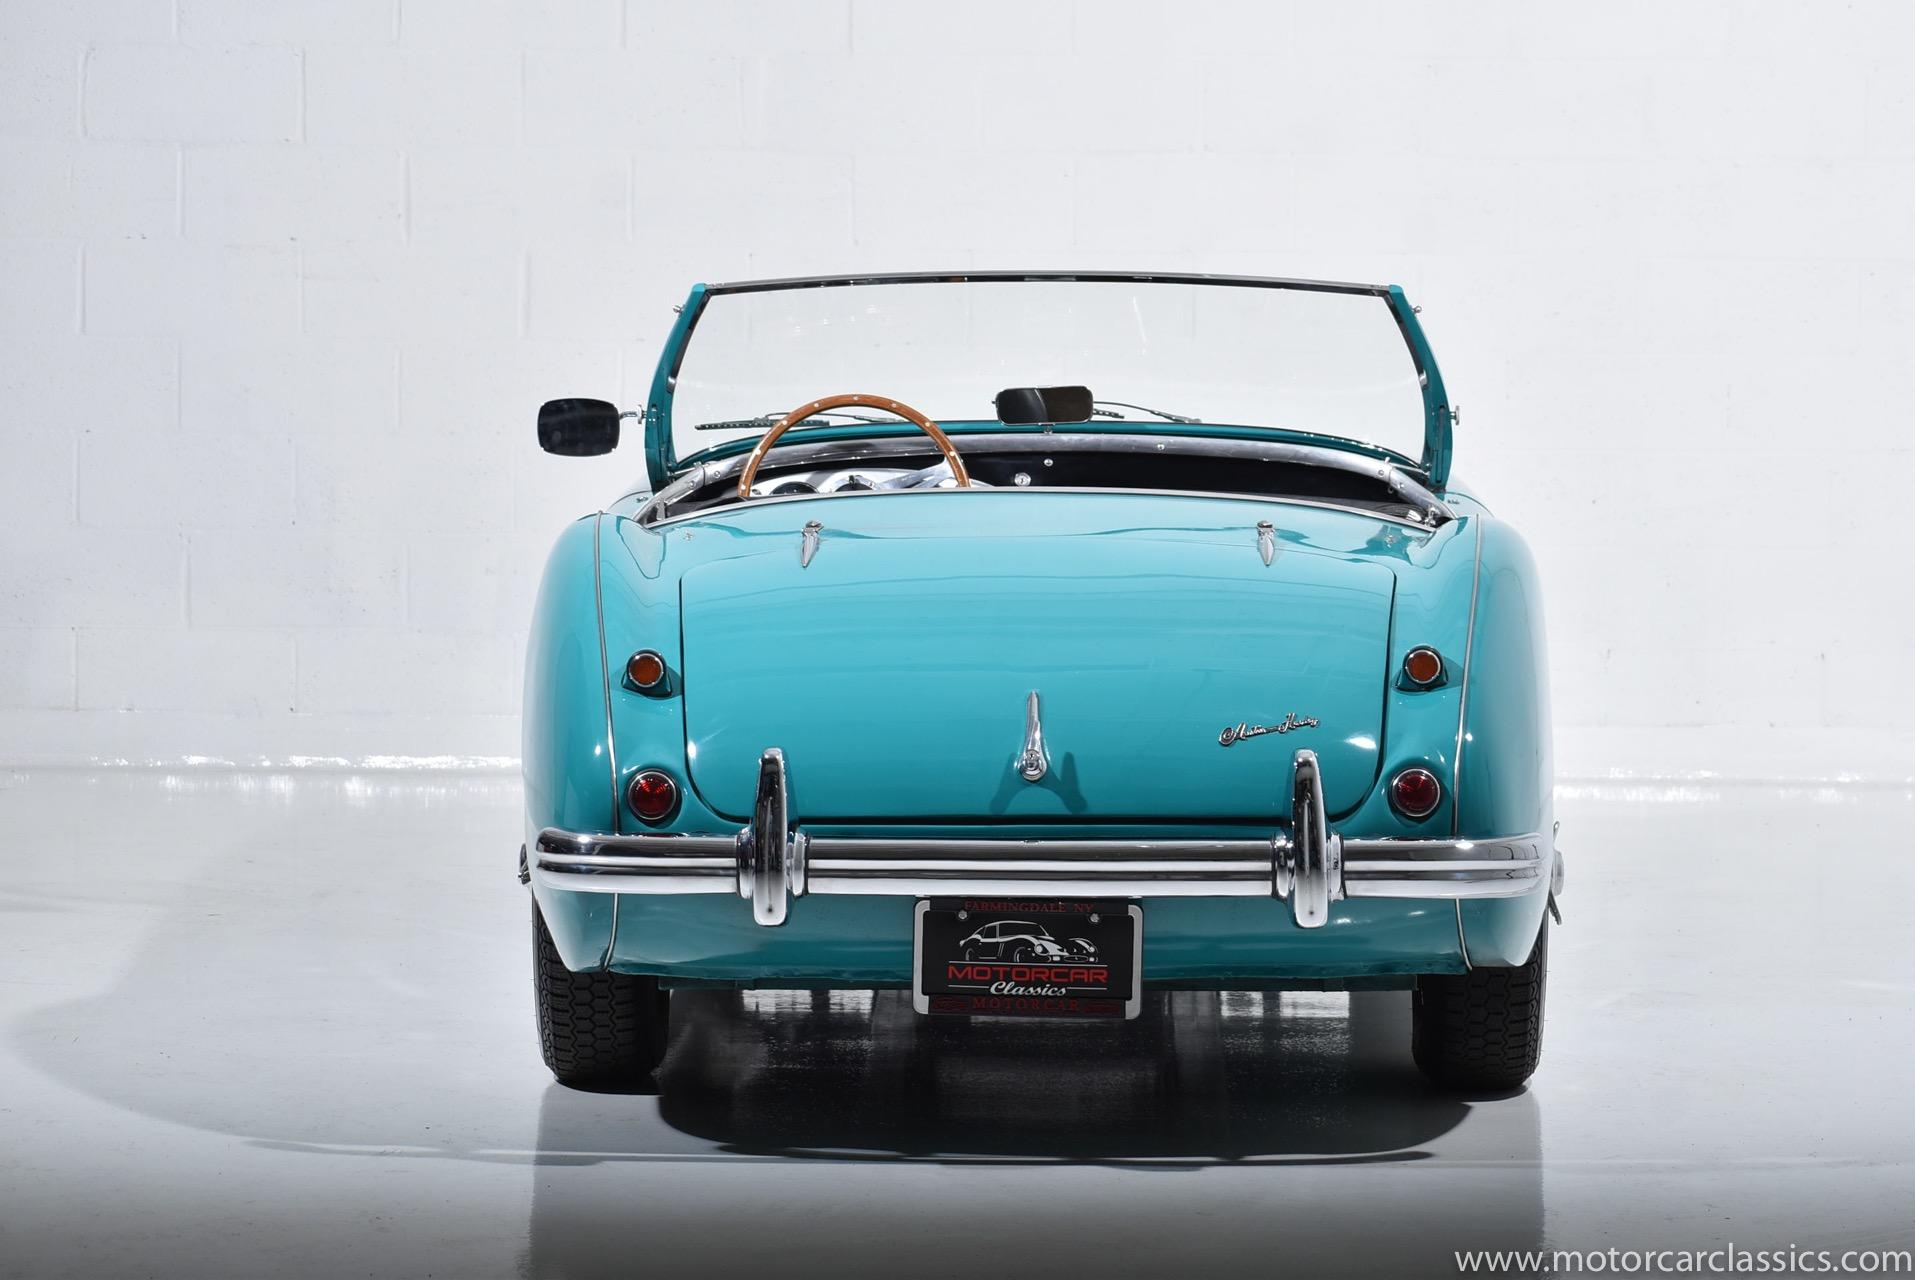 1956 Austin-Healey 100